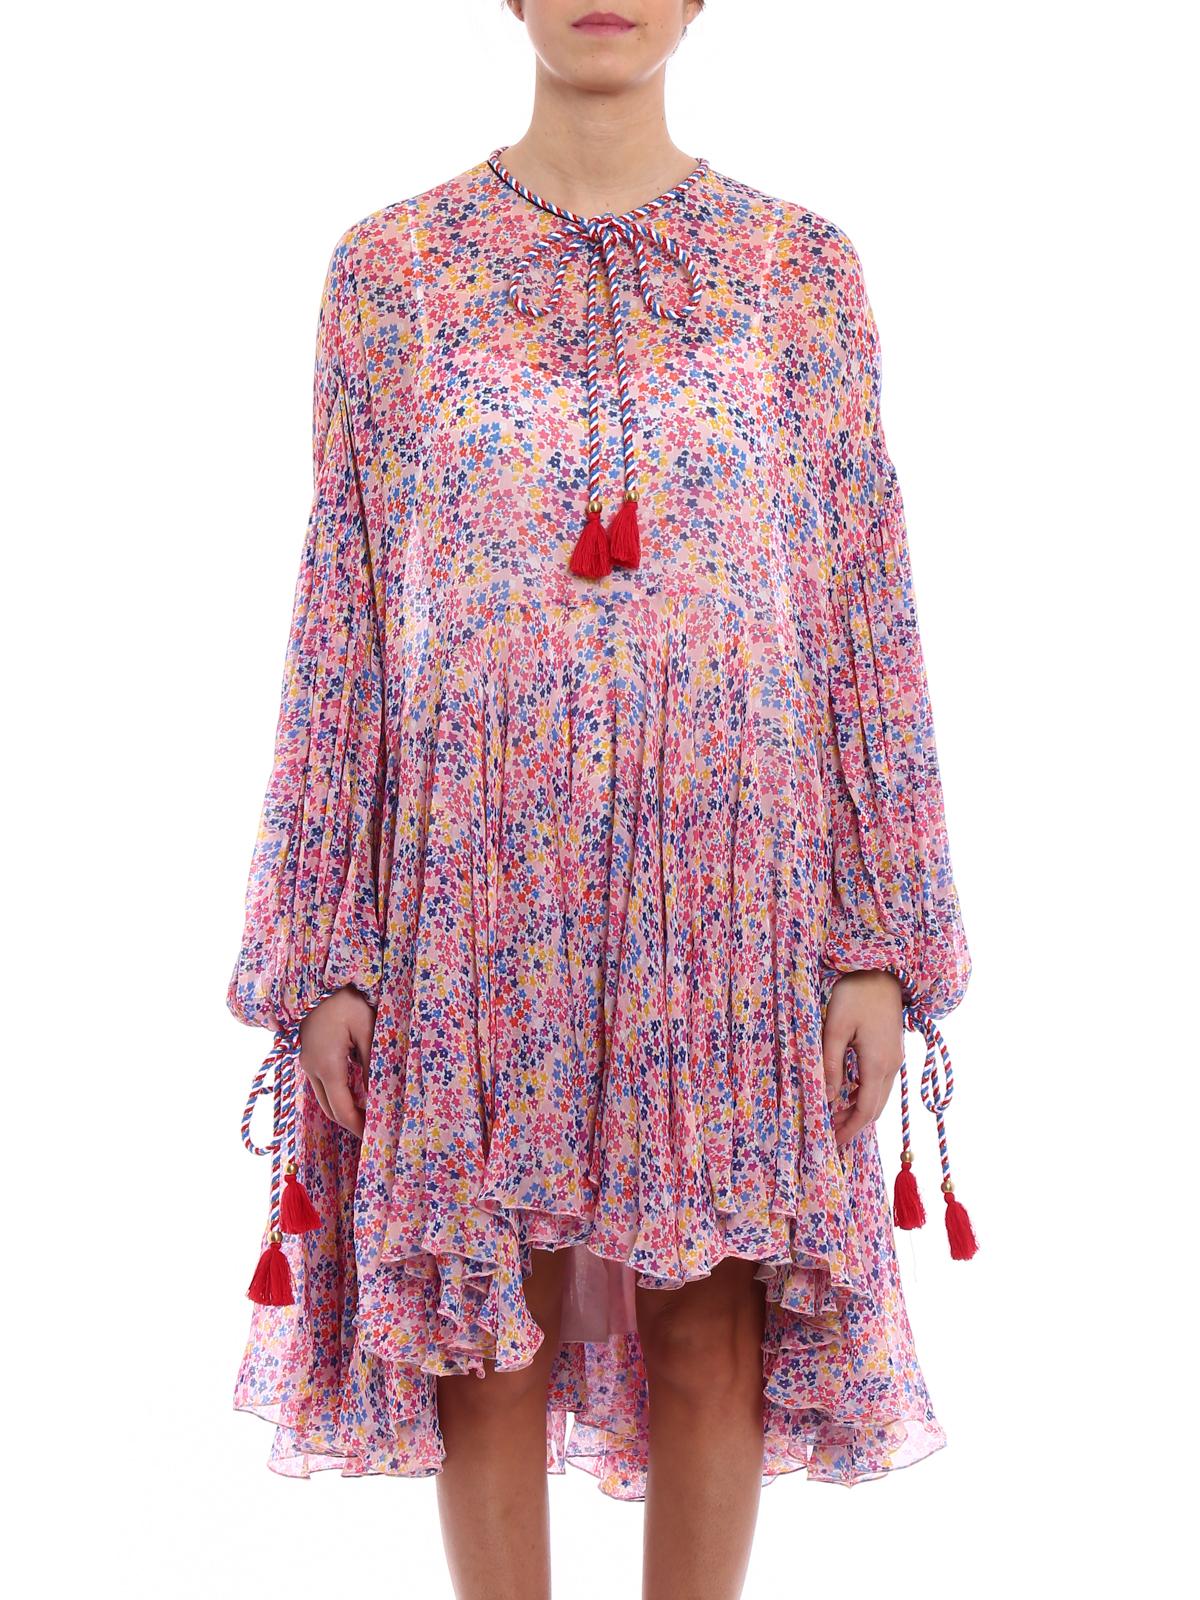 relaxed fit lace dress - Pink & Purple Philosophy di Lorenzo Serafini 9guUoMjwS